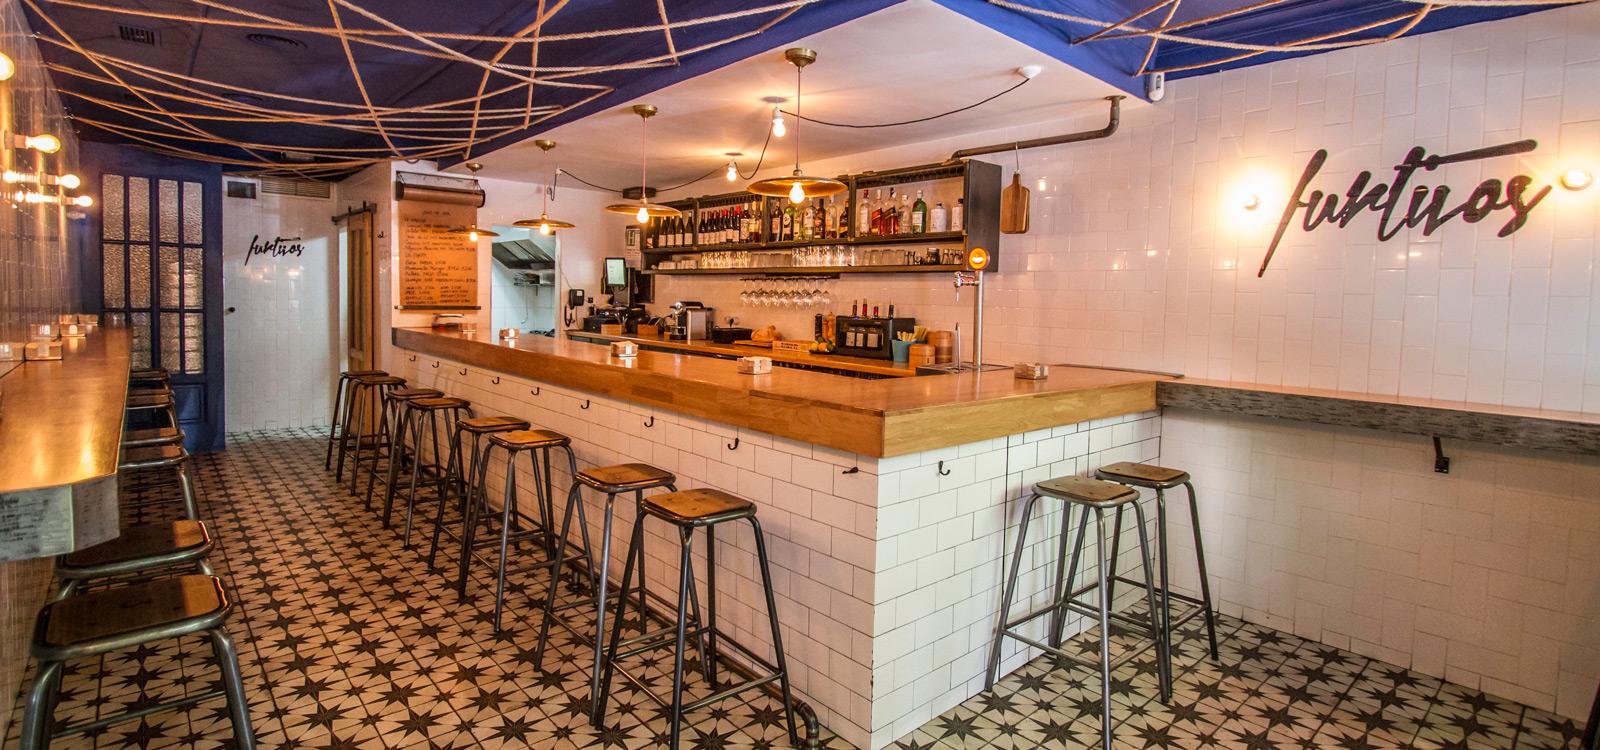 Restaurante Furtivos, Madrid. Ponzano